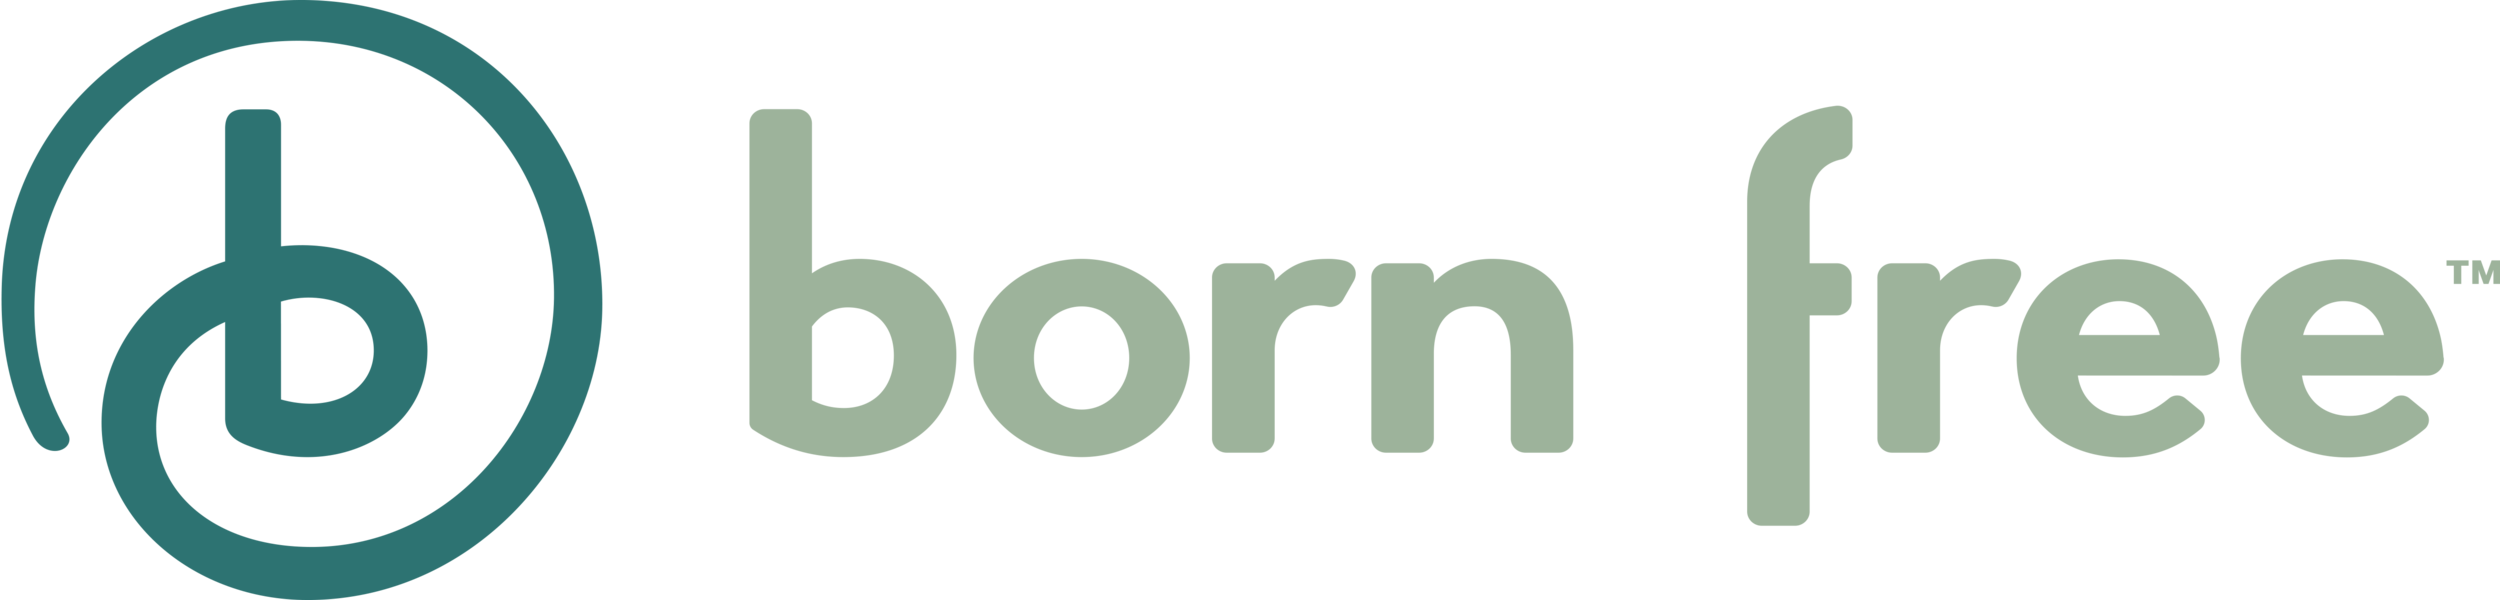 SUMR Brands_bornfree Logo_temp.png